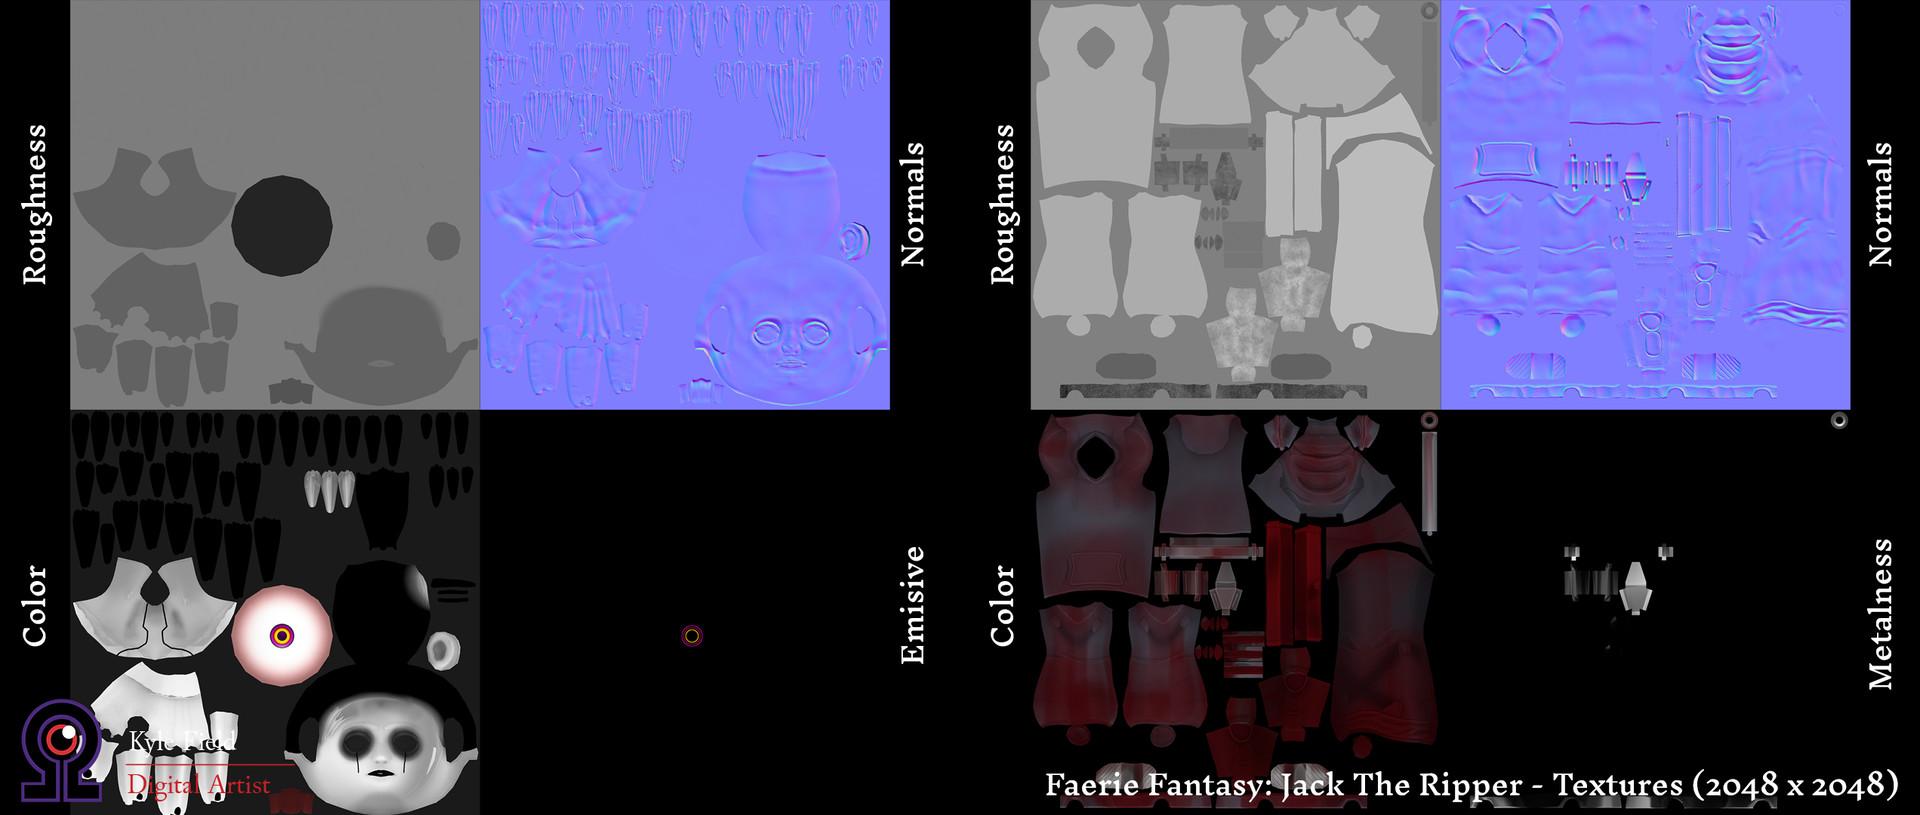 Kyle field jacktheripper rendersheet textures